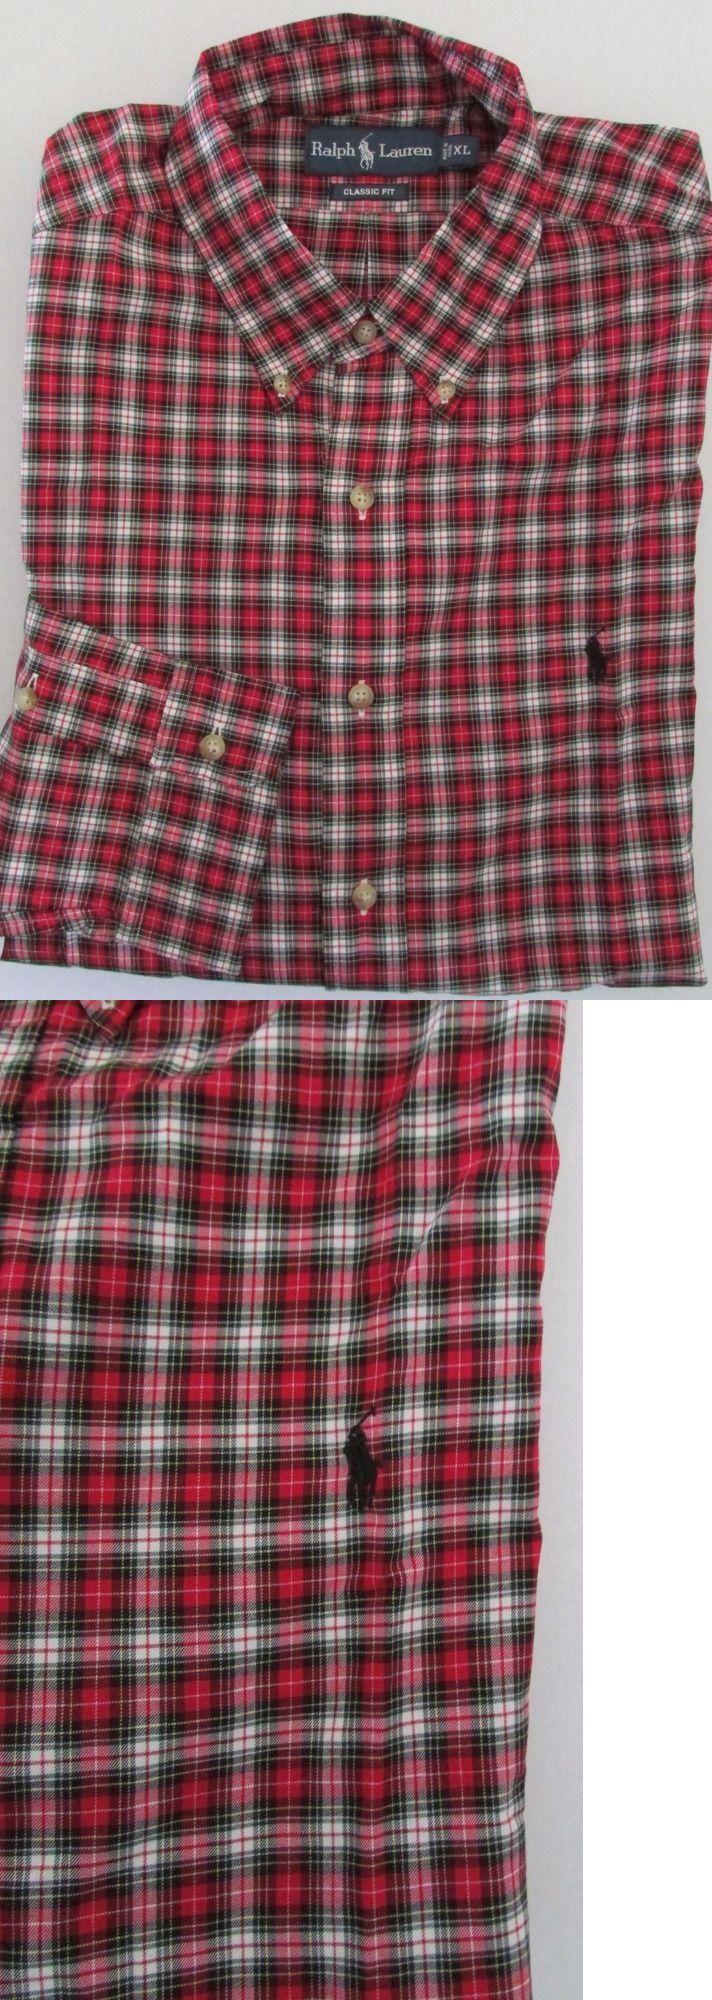 4ede71cfab Dress Shirts 57991  Nwt Ralph Lauren Casual Shirt Long Sleeve Red White  Green Plaid Black